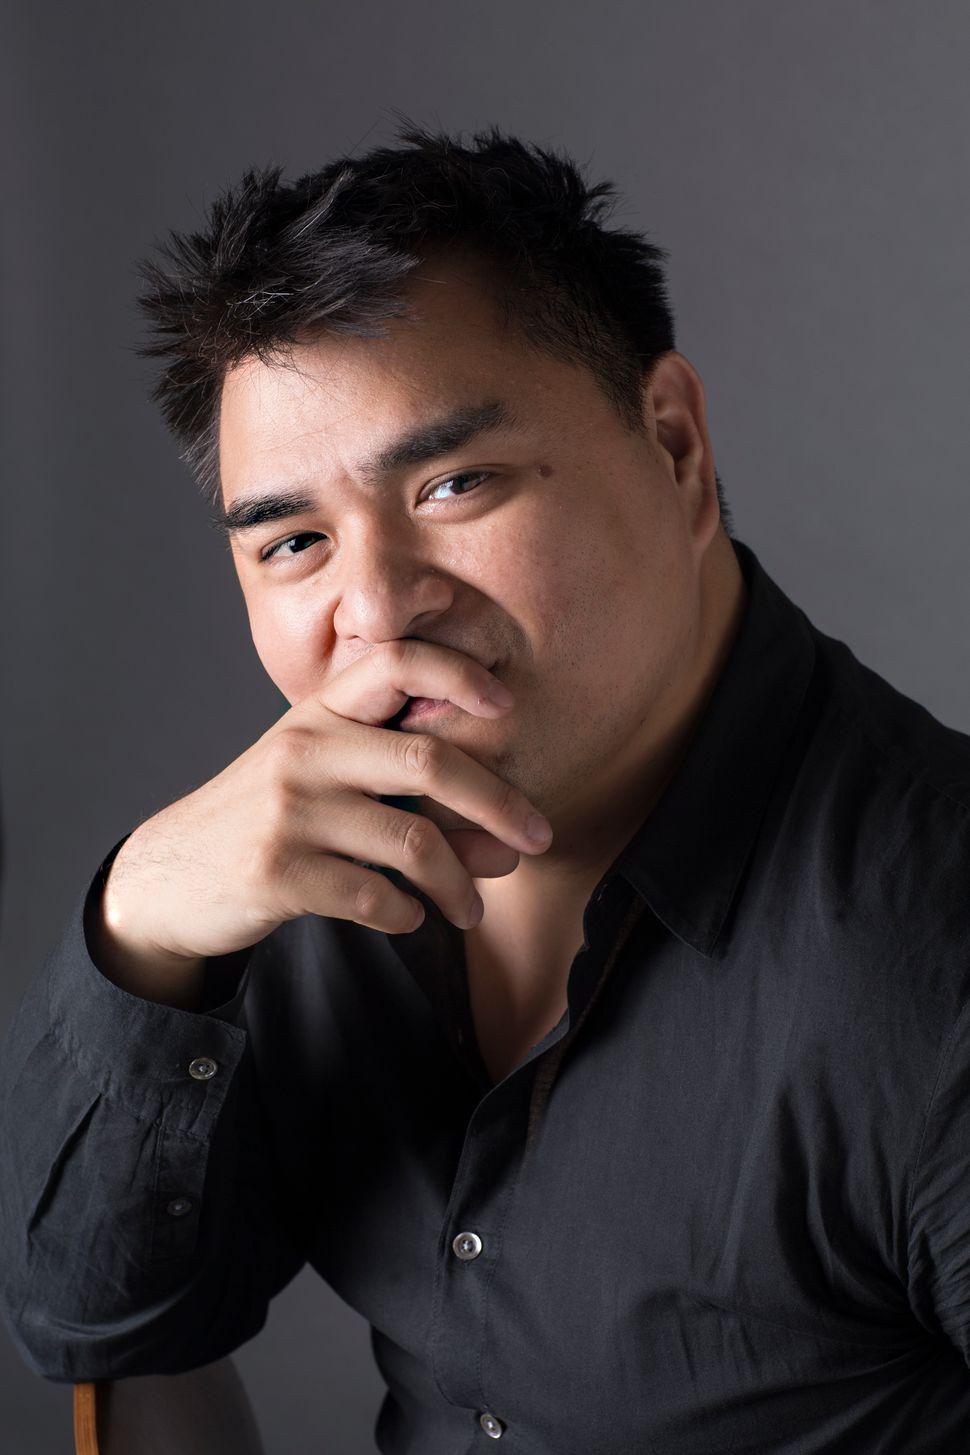 Jose Antonio Vargas, author of the memoir <i>Dear America, Notes of an Undocumented Citizen</i>.